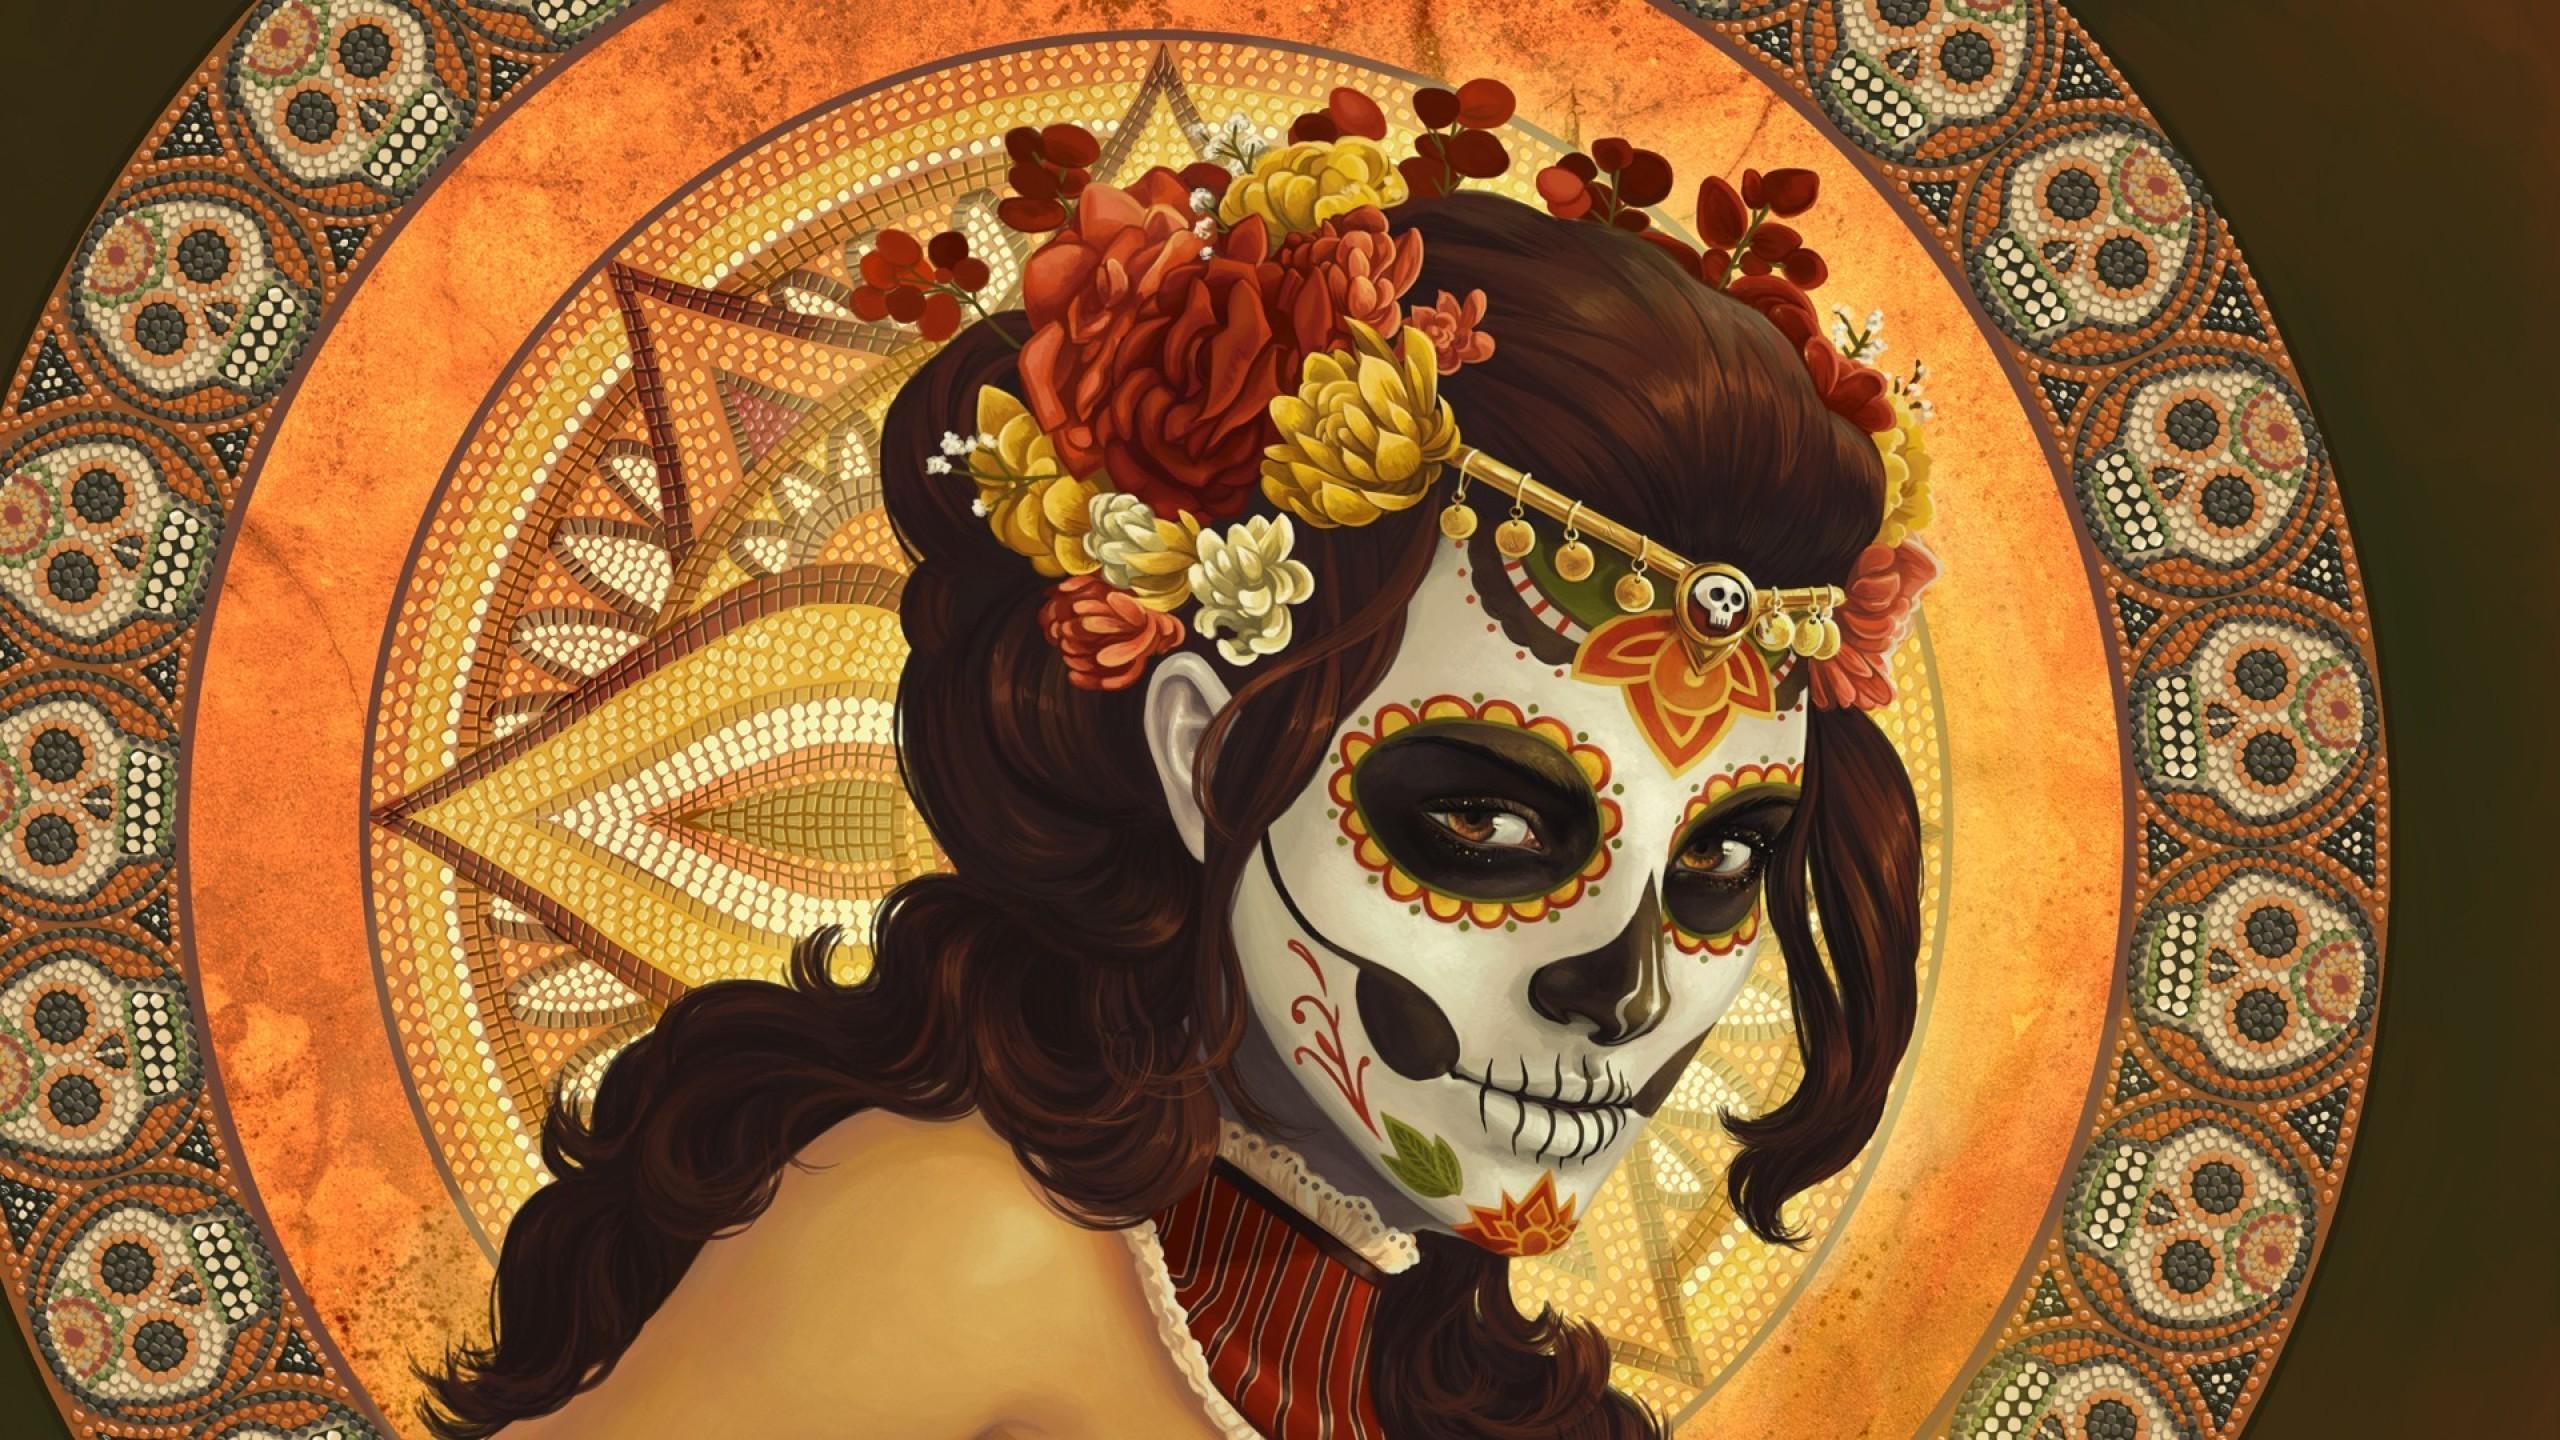 2560x1440 Px Artwork Dia De Los Muertos Digital Art Flowers Mexico Mosaic Pattern Skull Sugar